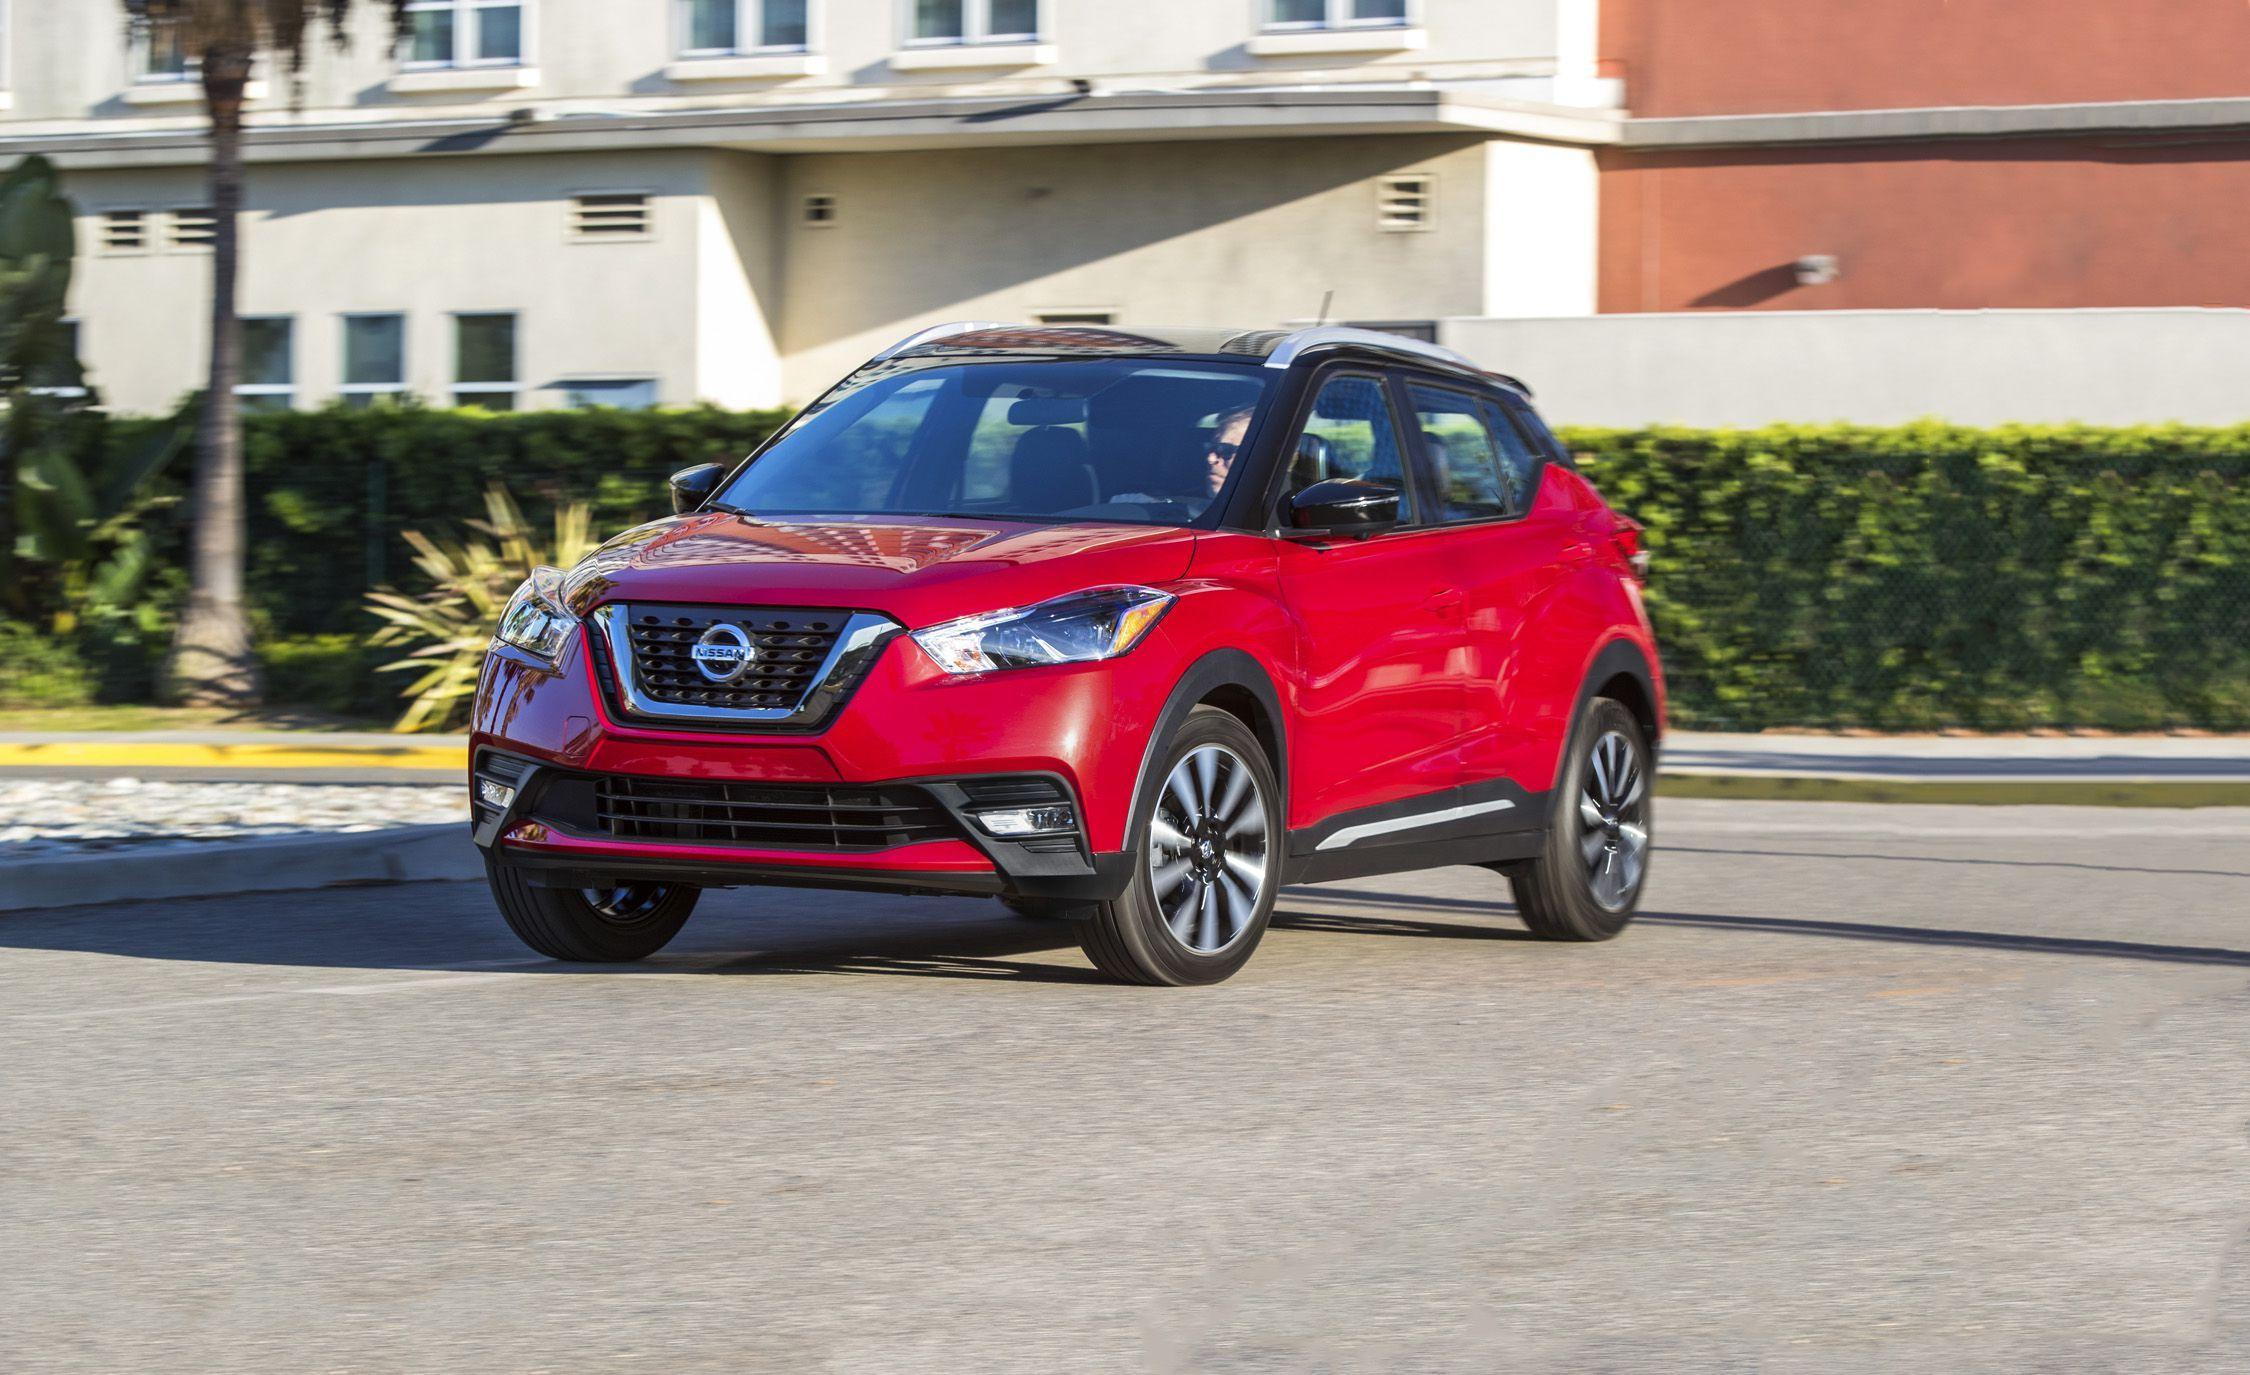 2020 Nissan Kicks Review Pricing And Specs Nissan City Car Kicks